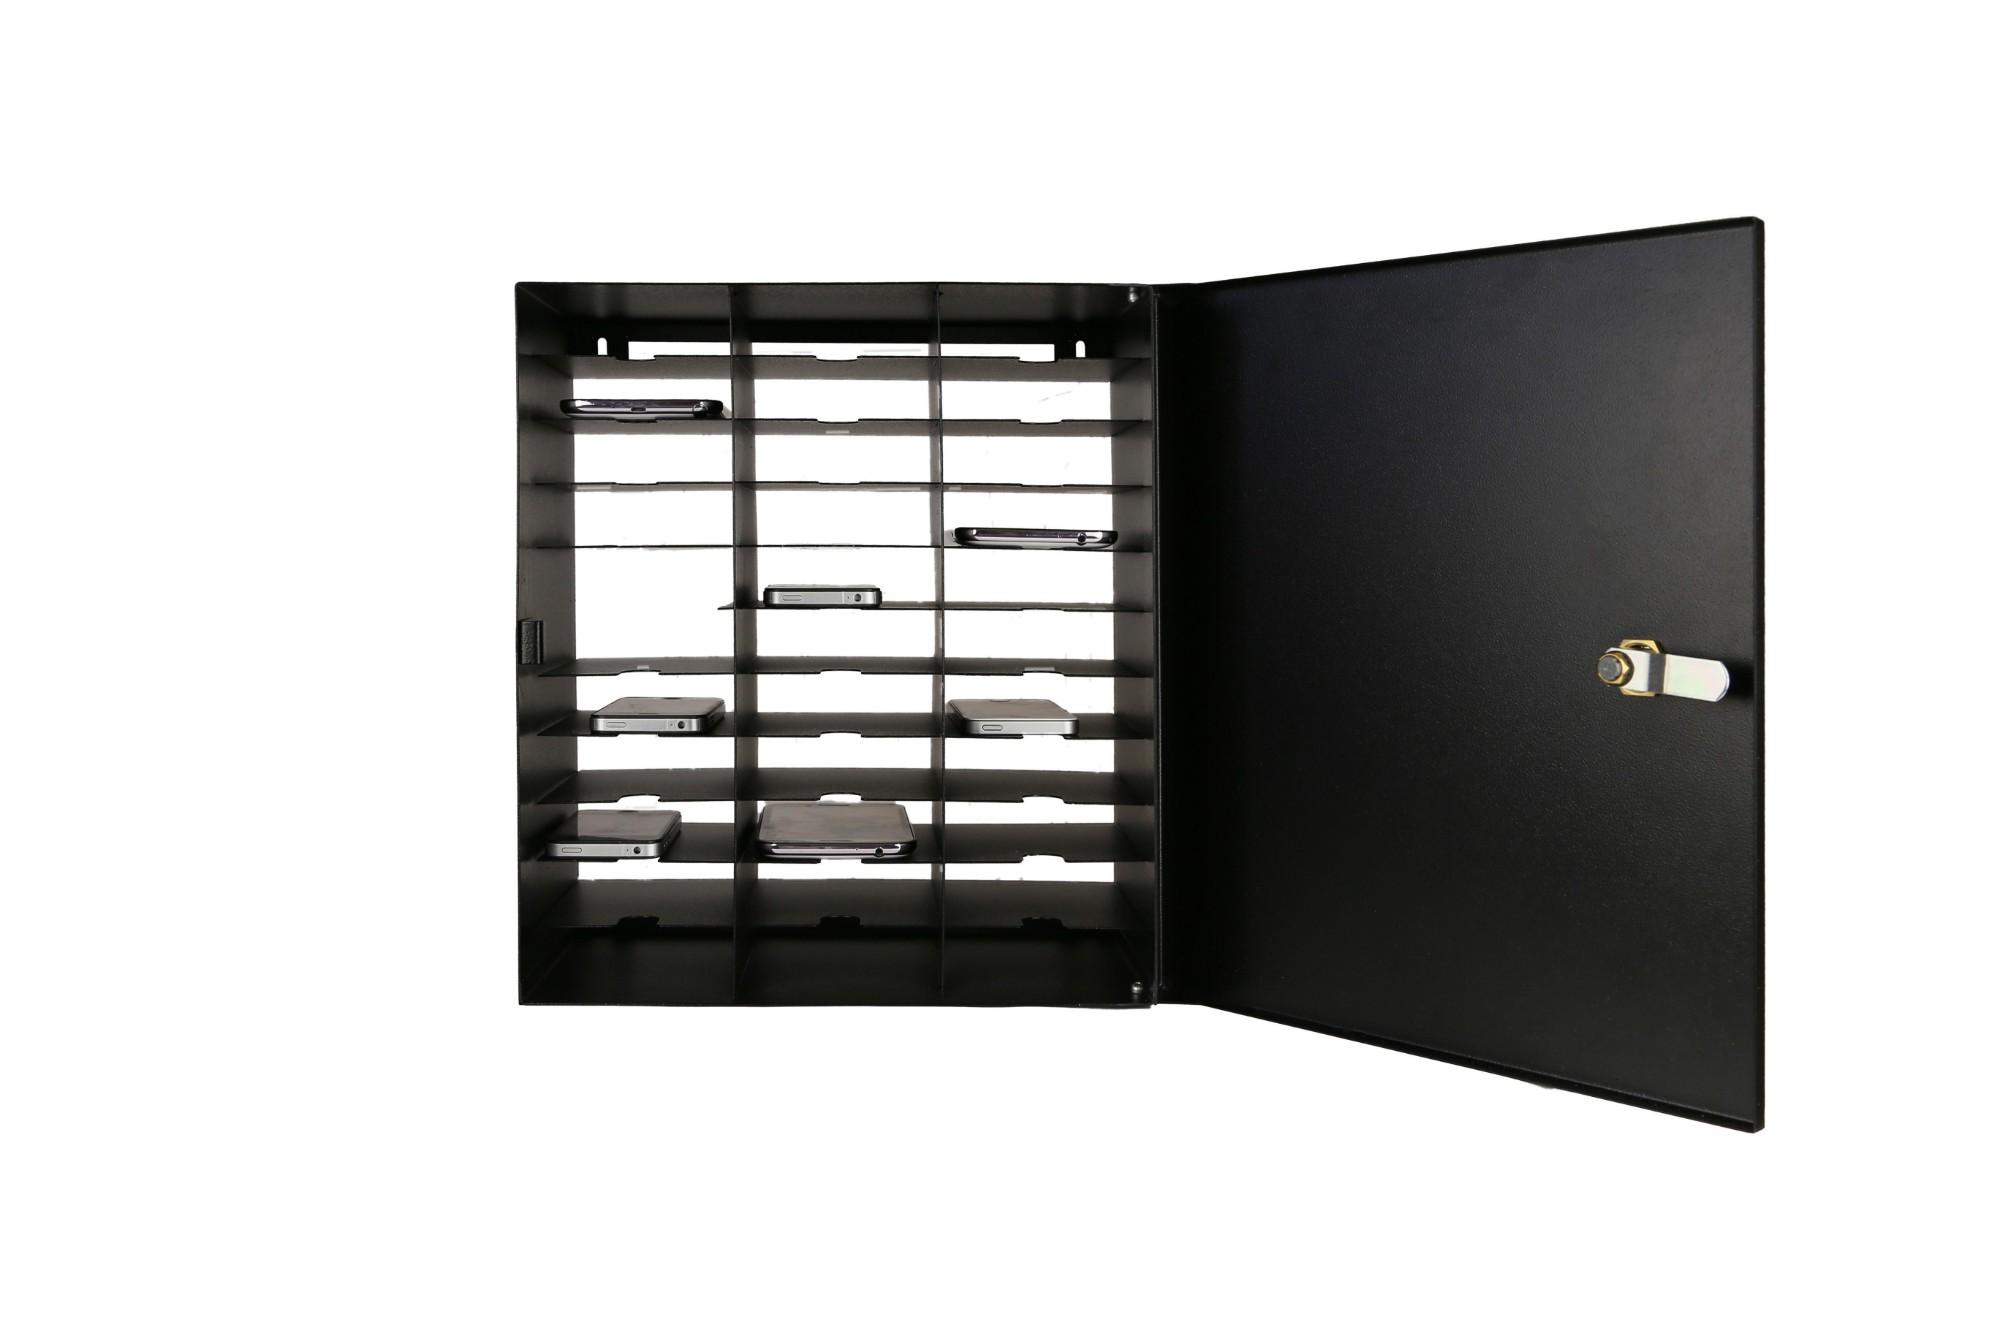 Leba NoteBox Mobile Portable device management cabinet Black